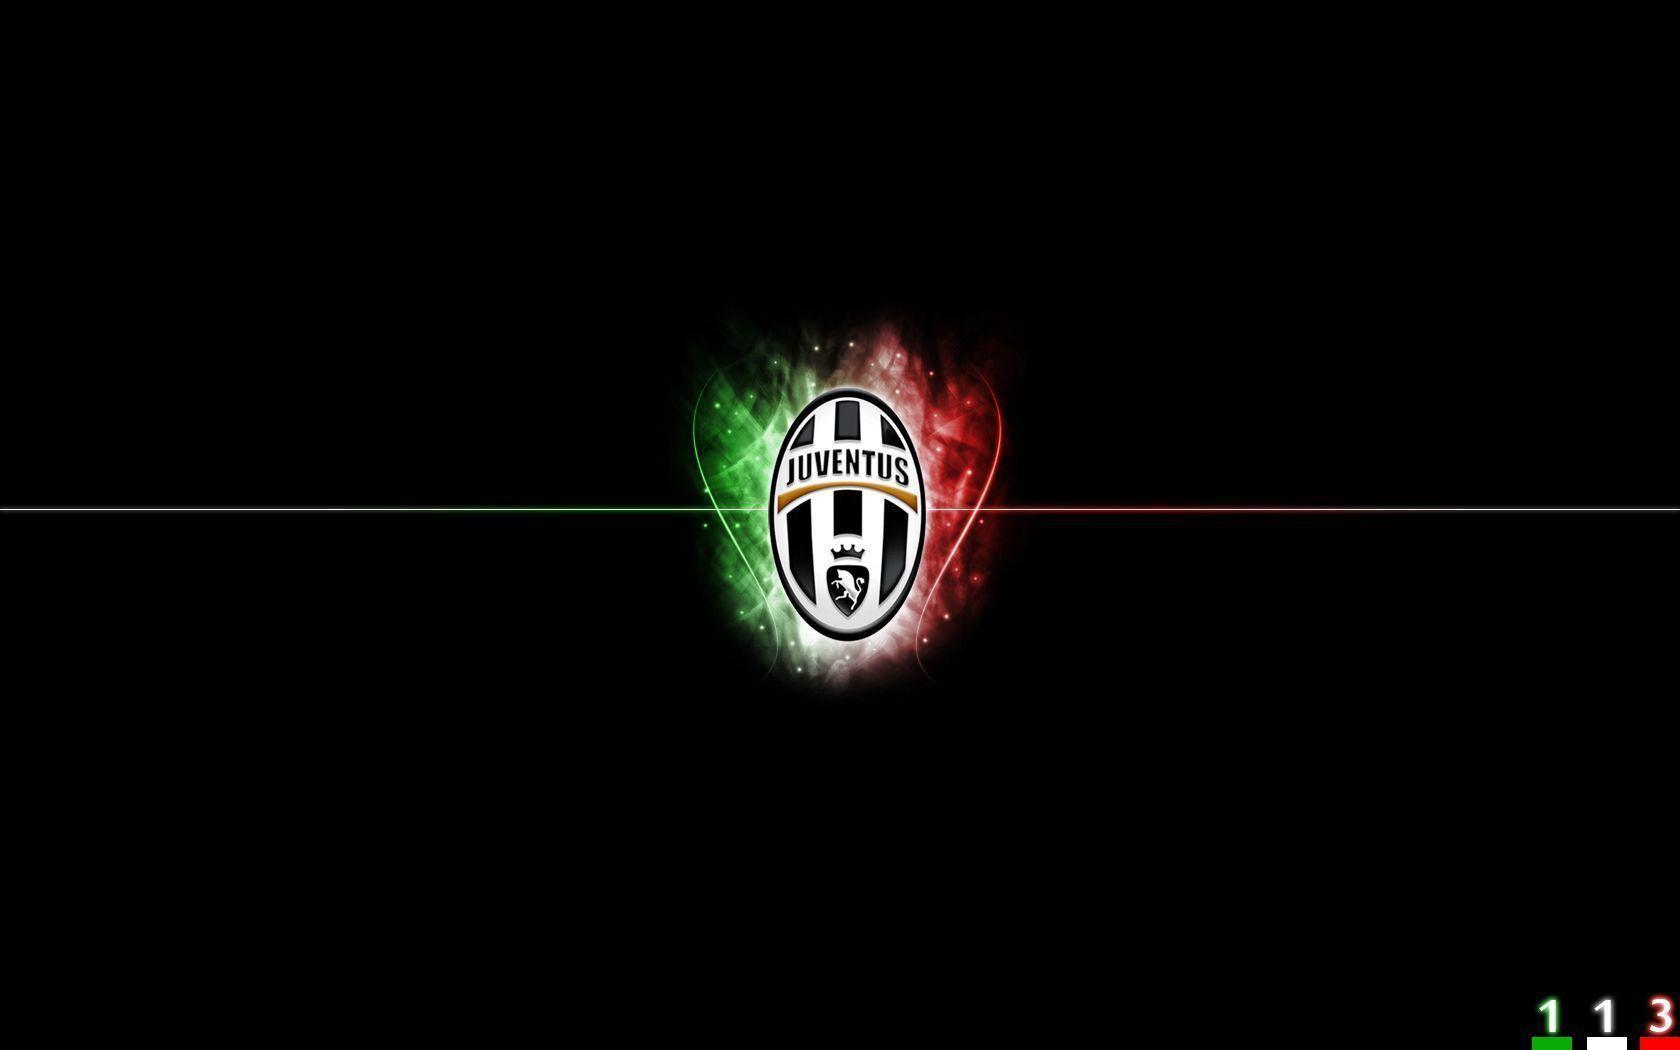 Juventus Wallpaper Iphones HD #11977 Wallpaper | Cool ...